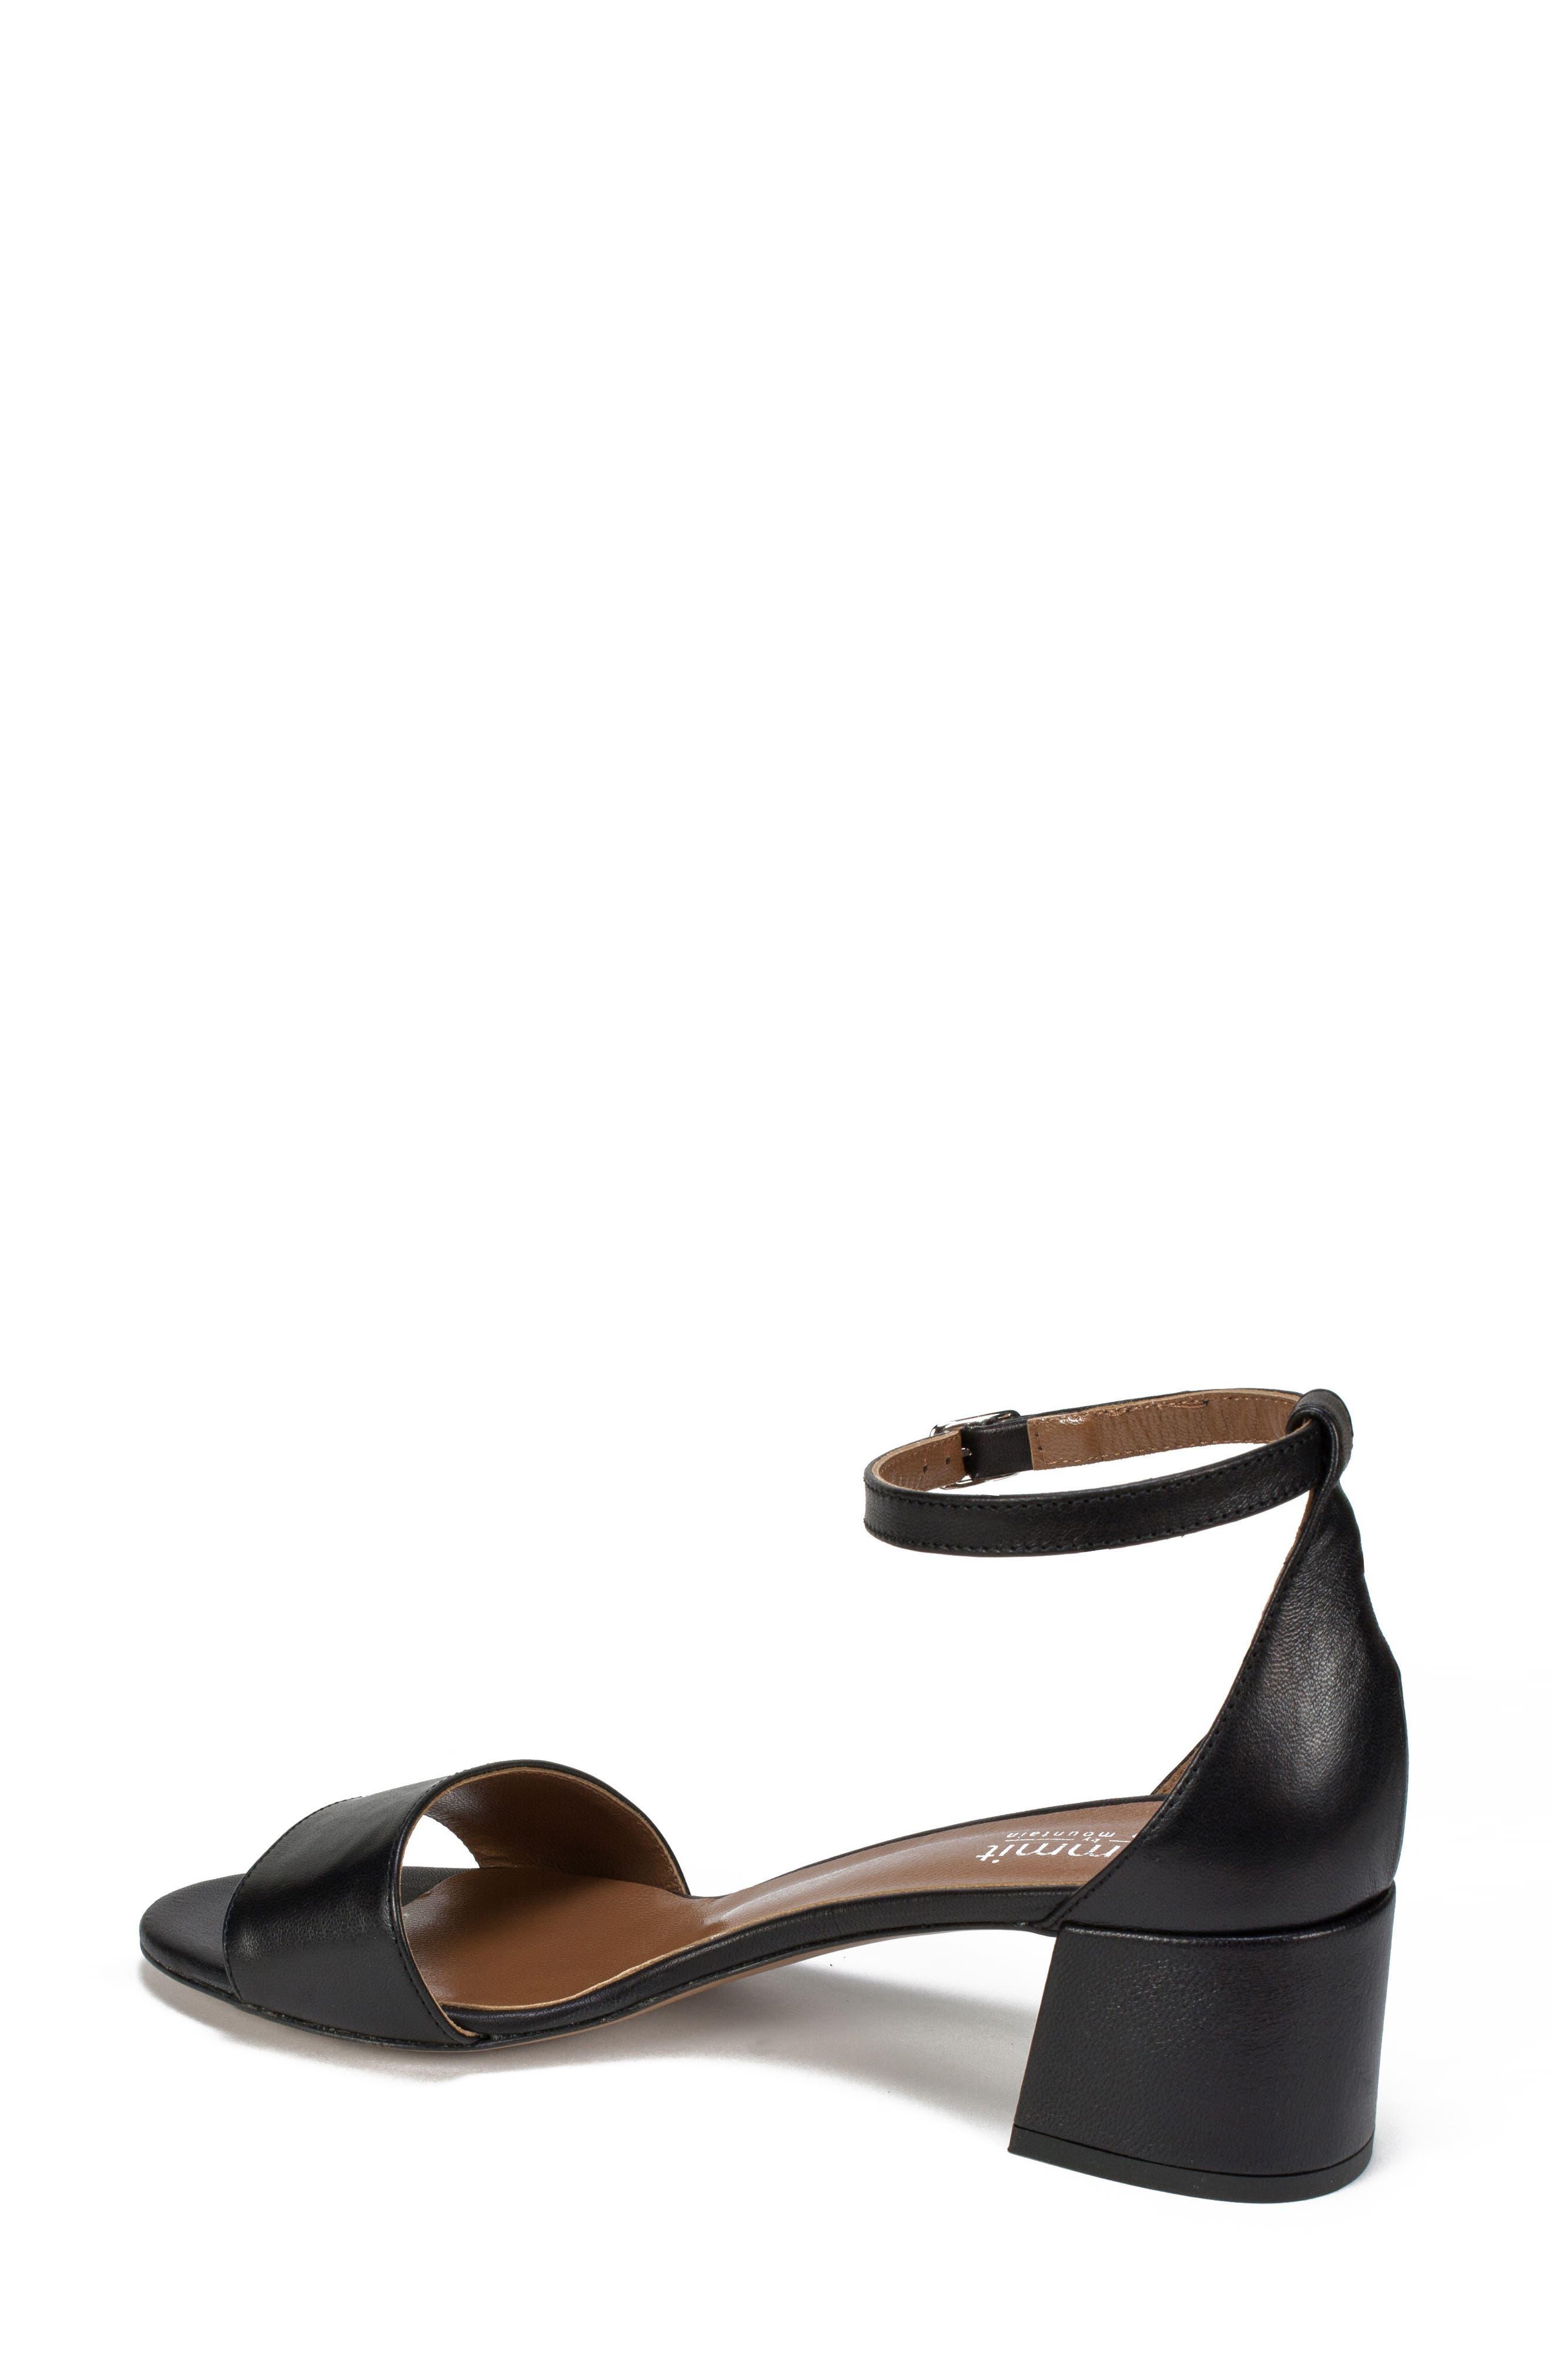 Ameila Block Heel Sandal,                             Alternate thumbnail 2, color,                             Black Leather